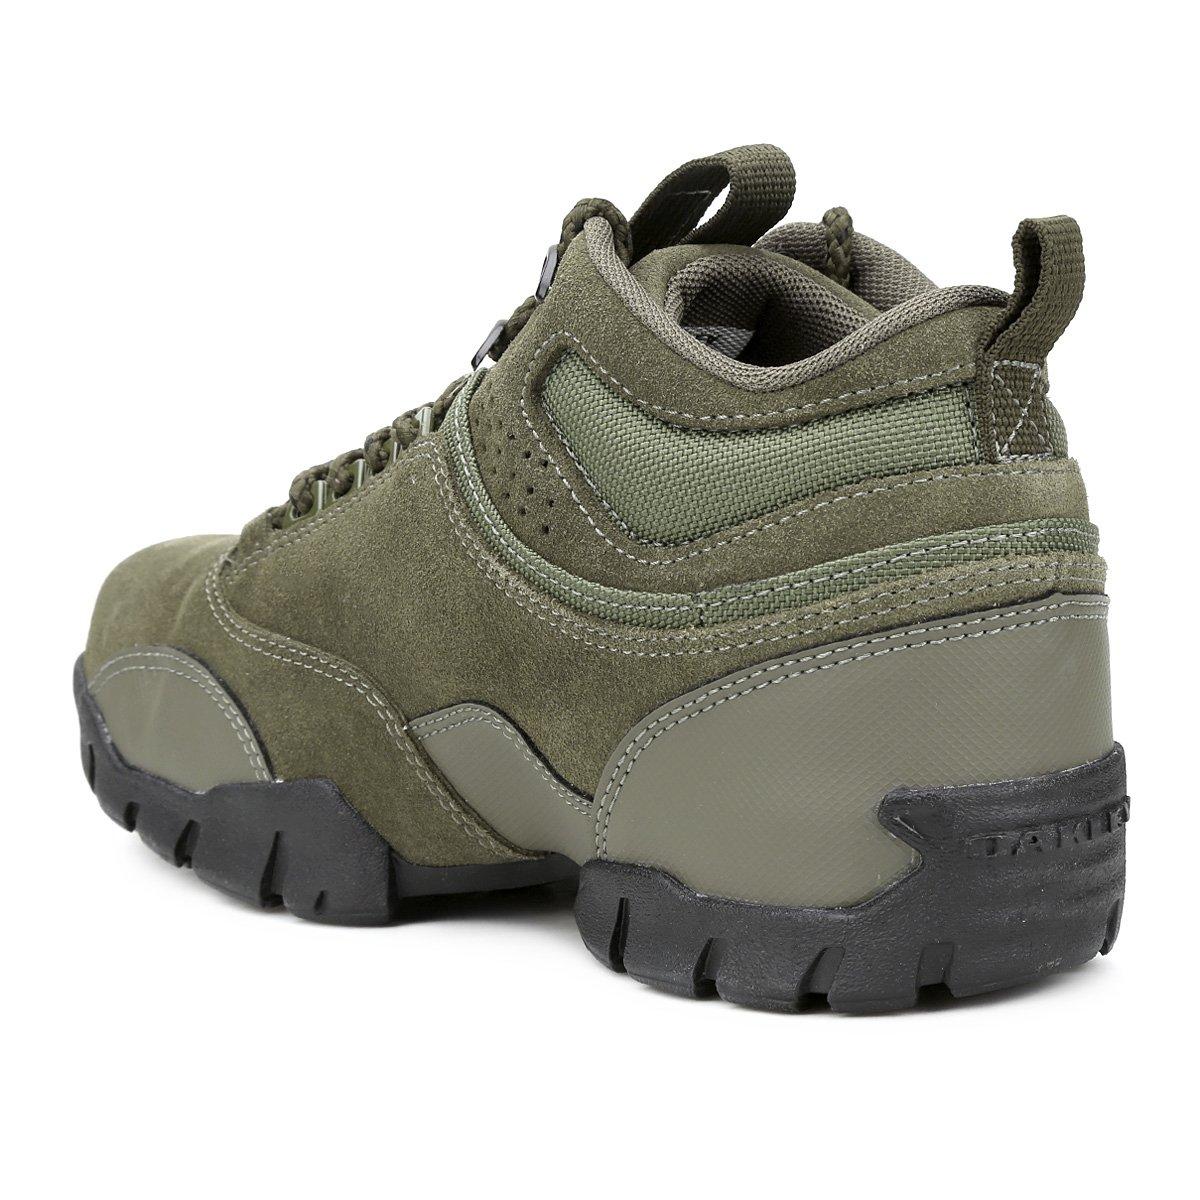 55db462fe4 Netshoes  Tênis Oakley Modoc Masculino - Verde - R 265